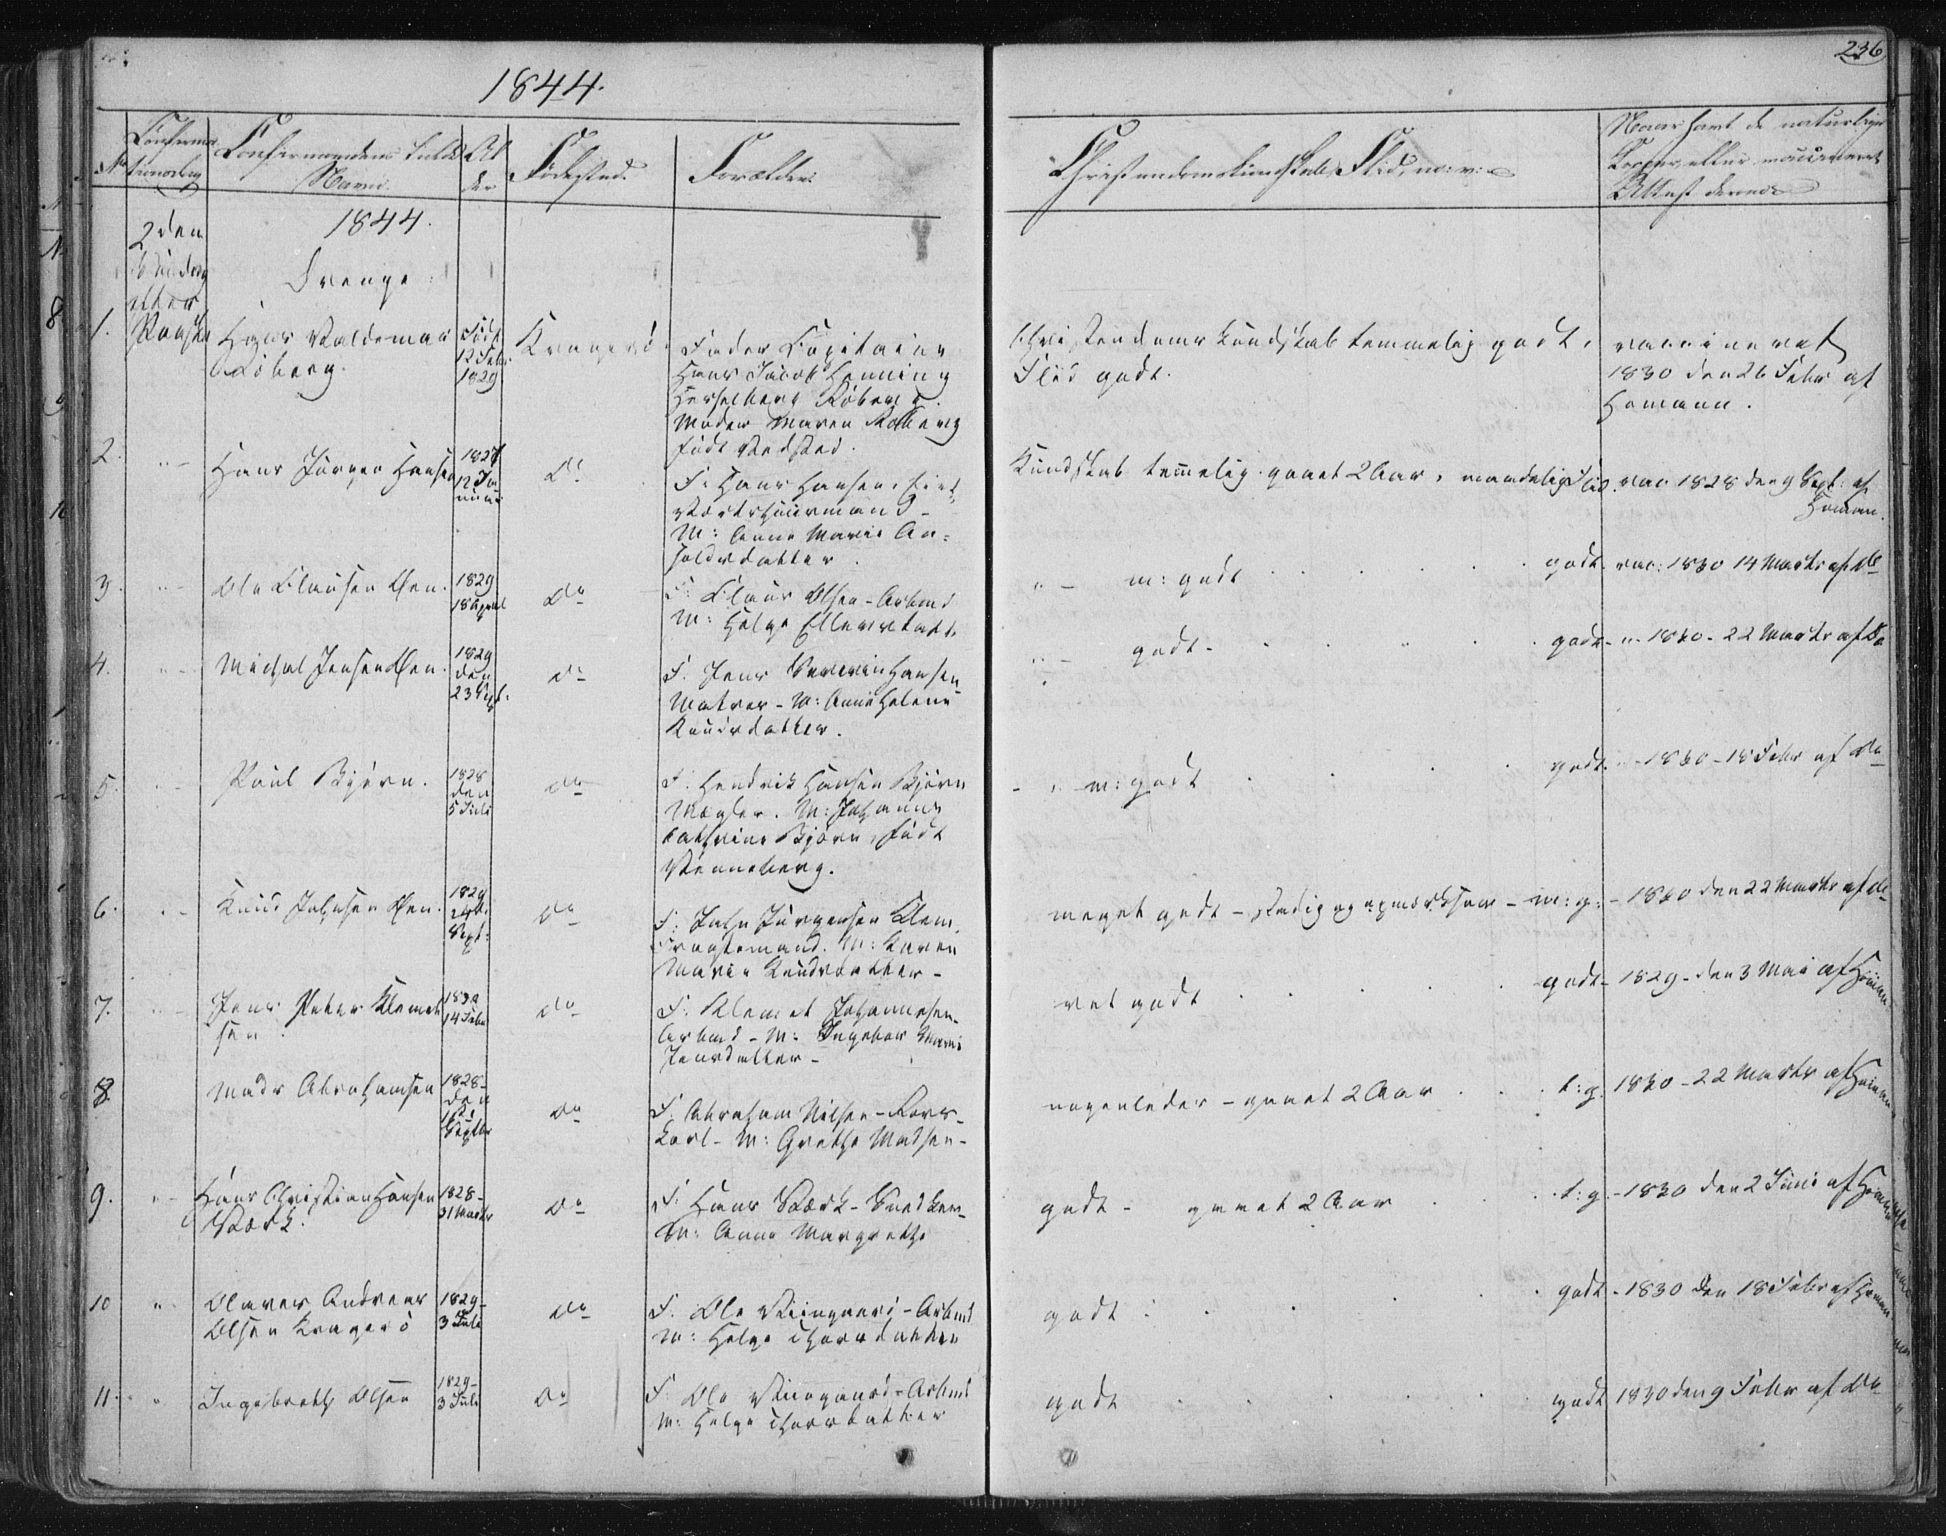 SAKO, Kragerø kirkebøker, F/Fa/L0005: Ministerialbok nr. 5, 1832-1847, s. 236